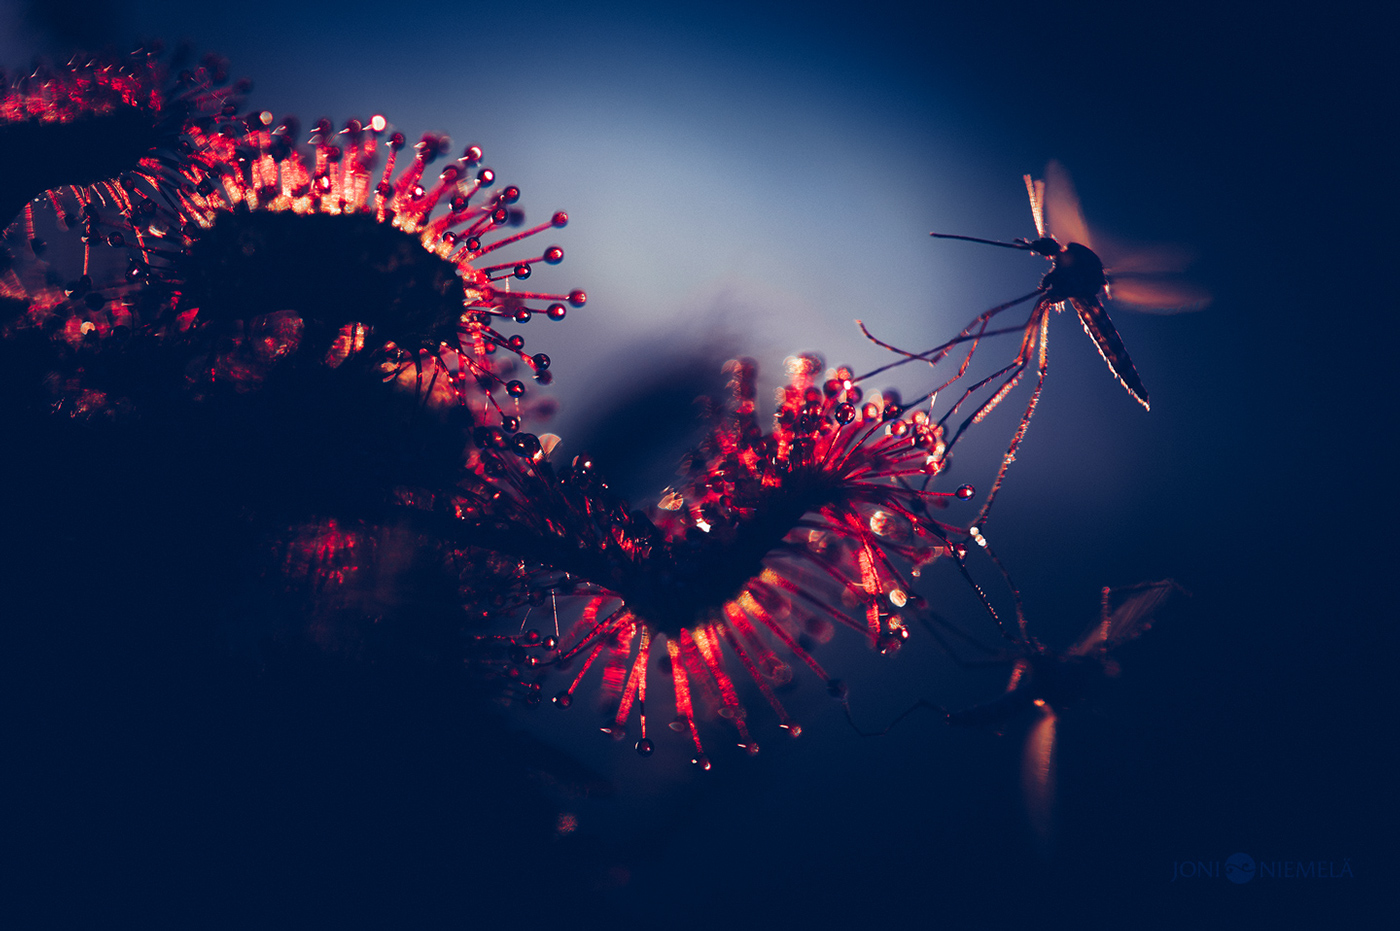 Joni Niemelä,  Otherworldly Blues